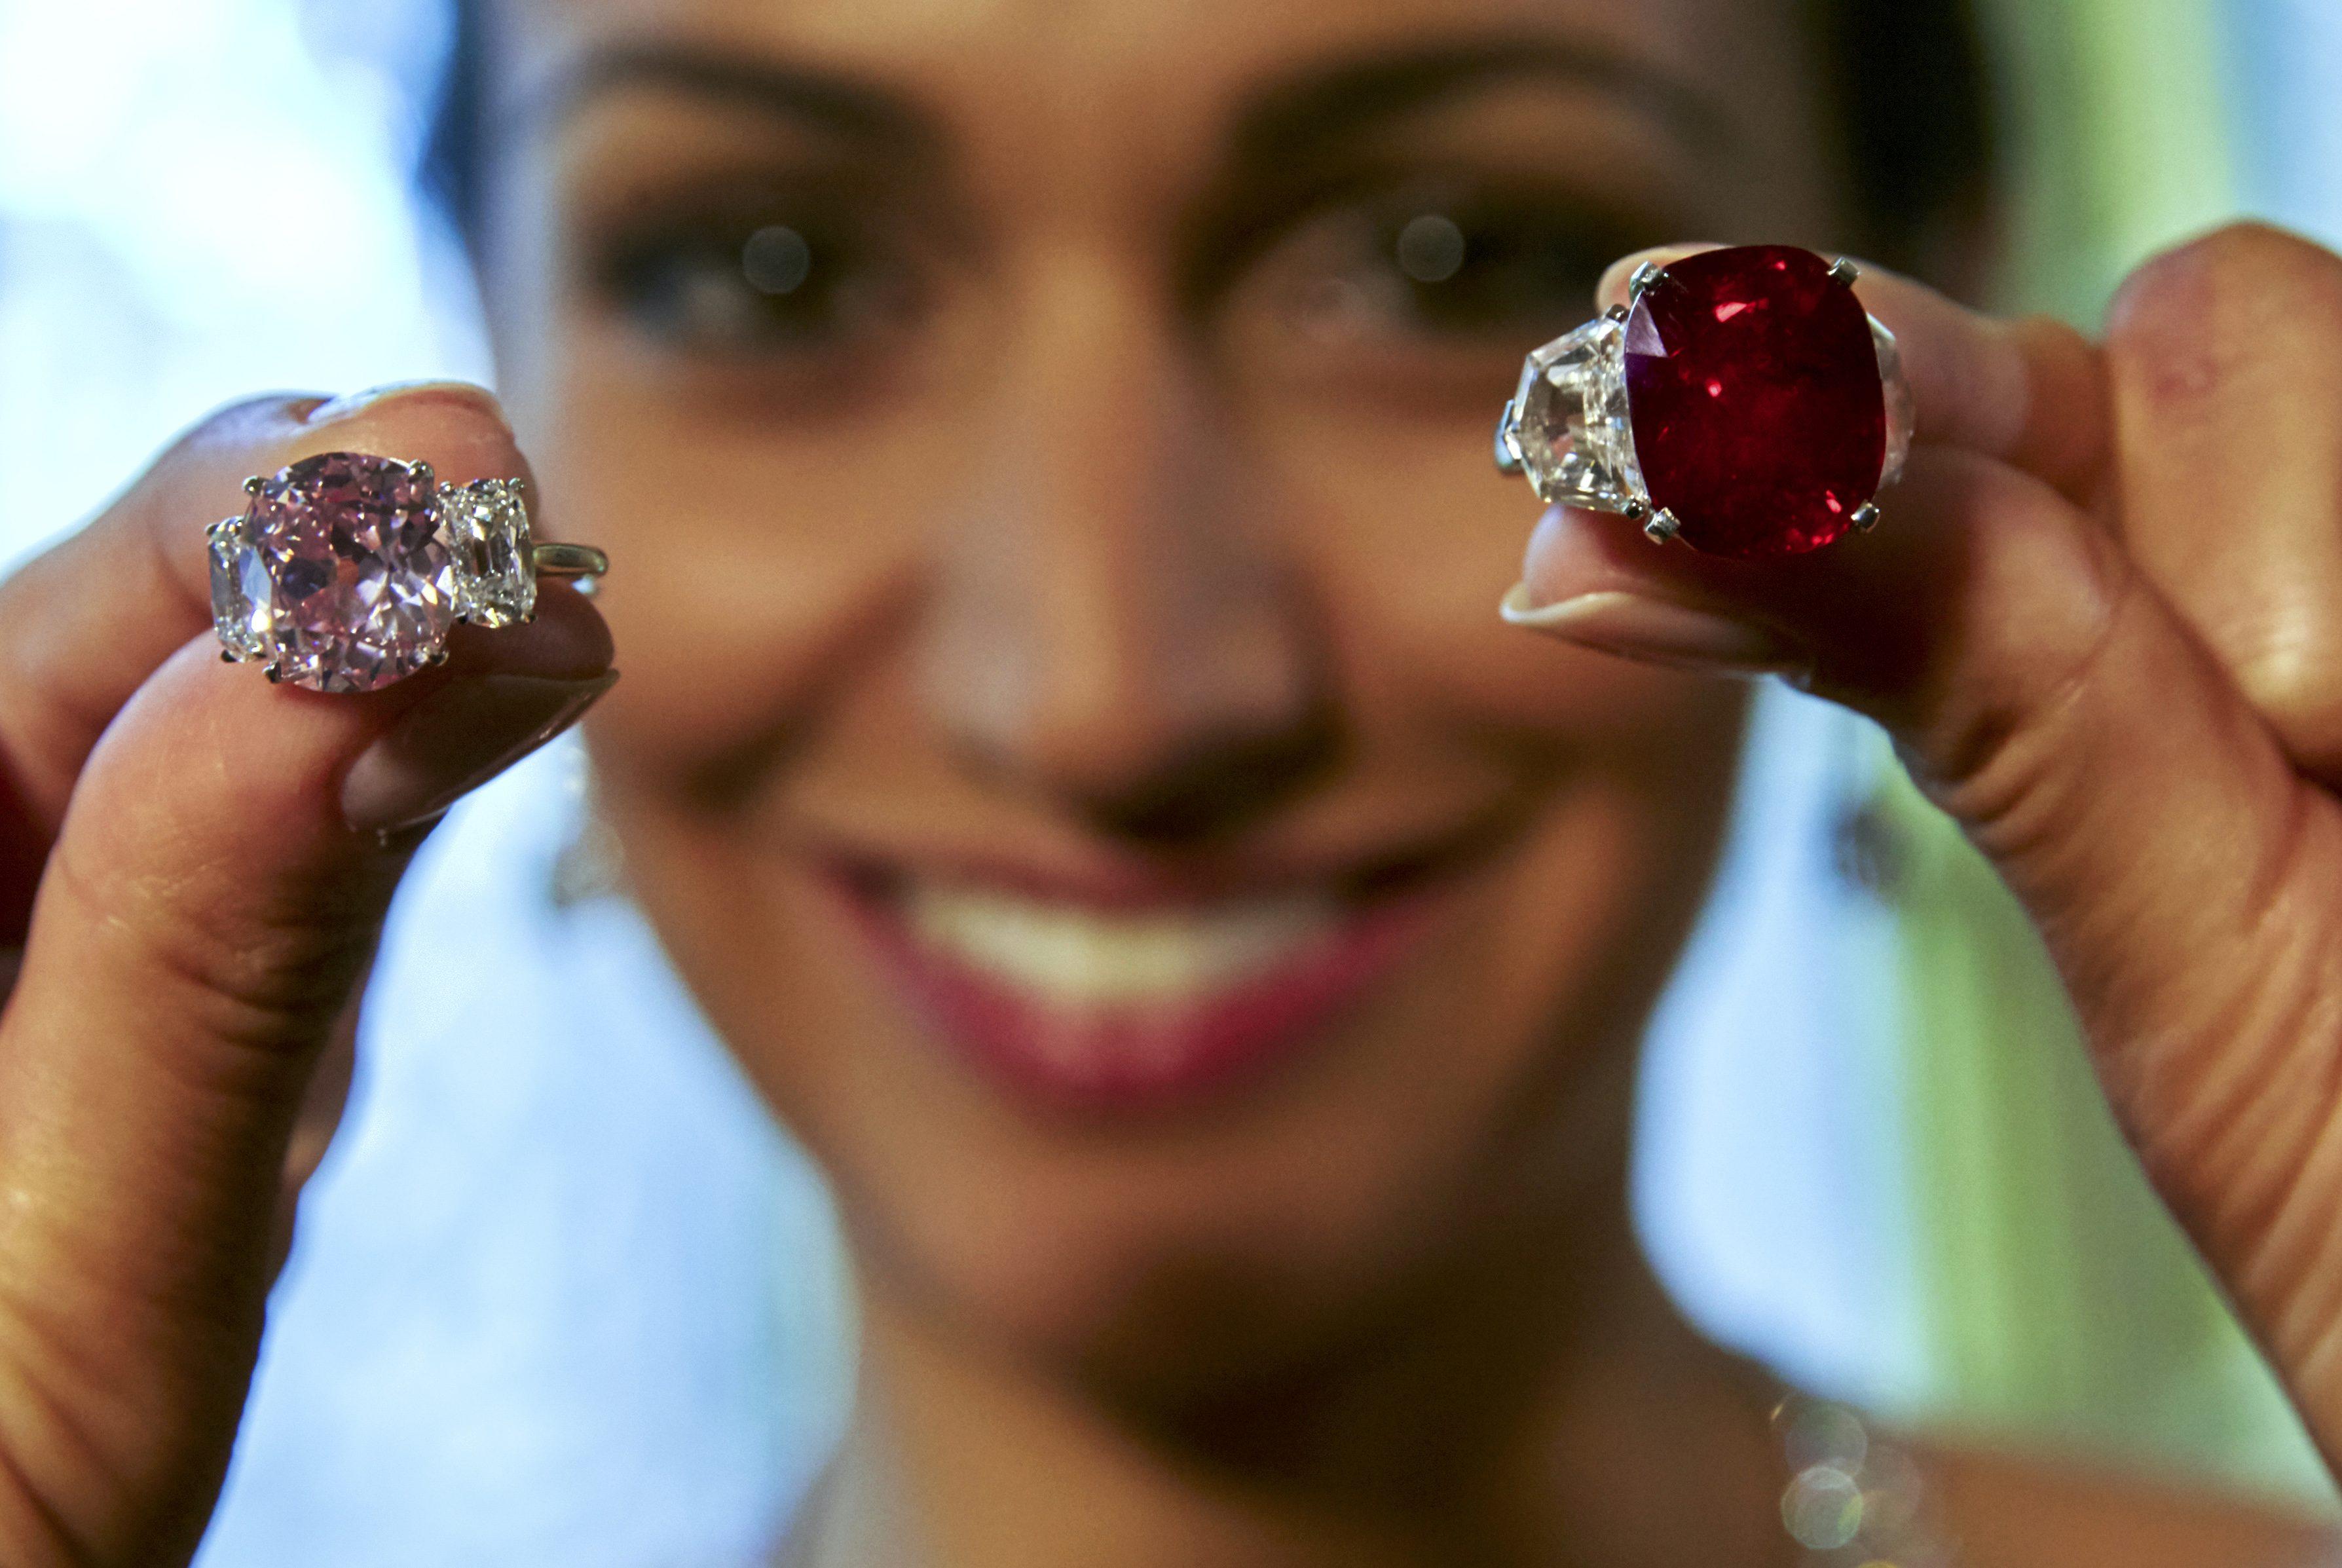 "Seorang model memperlihatkan ""Delima Matahari Terbit"" (kanan), sebuah batu delima Birma seberat 25,59 karat, dan ""Berlian Merah Muda Bersejarah"", sebuah berlian berwarna seberat 8,72 karat saat pratinjau lelang di Balai Lelang Sotheby's, Jenewa, Swiss, Rabu (6/5). Batu delima itu diperkirakan dapat terjual dengan harga sekitar 12-18 juta dolar AS (157-236 miliar rupiah), sementara berlian merah muda tersebut akan terjual sekitar 14-18 juta dolar (183-236 miliar rupiah) saat mereka dilelang di Jenewa 12 Mei mendatang. ANTARA FOTO/REUTERS/Denis Balibouse."